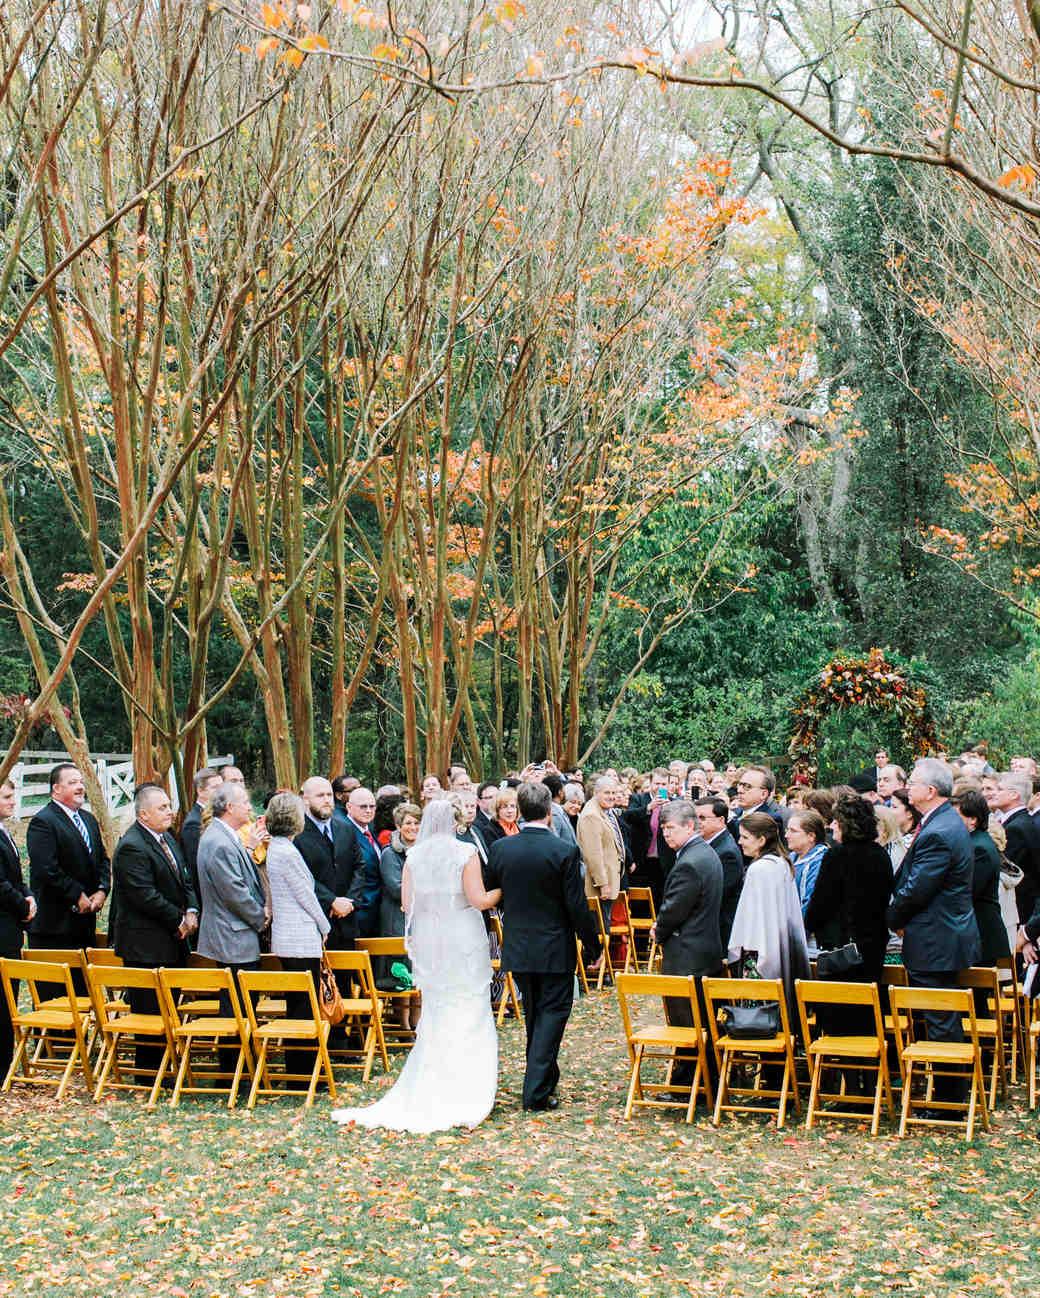 brittany-andrew-wedding-ceremony-053-s112067-0715.jpg